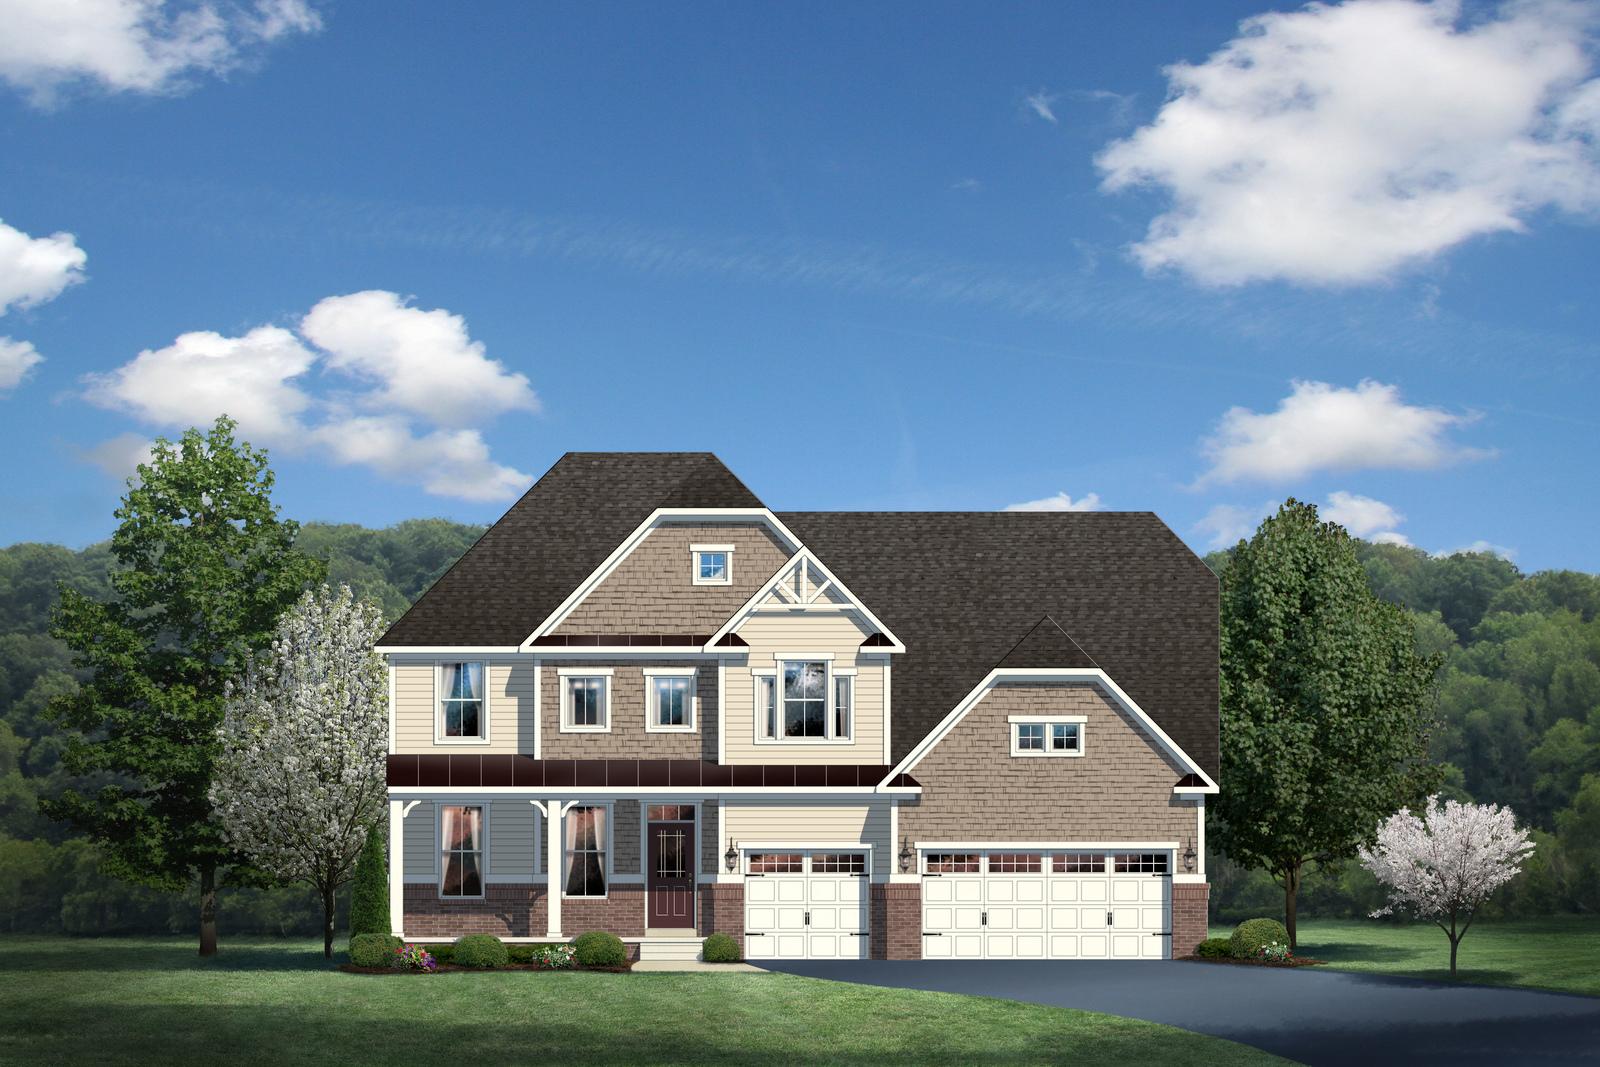 New landon home model for sale heartland homes for Heartland house